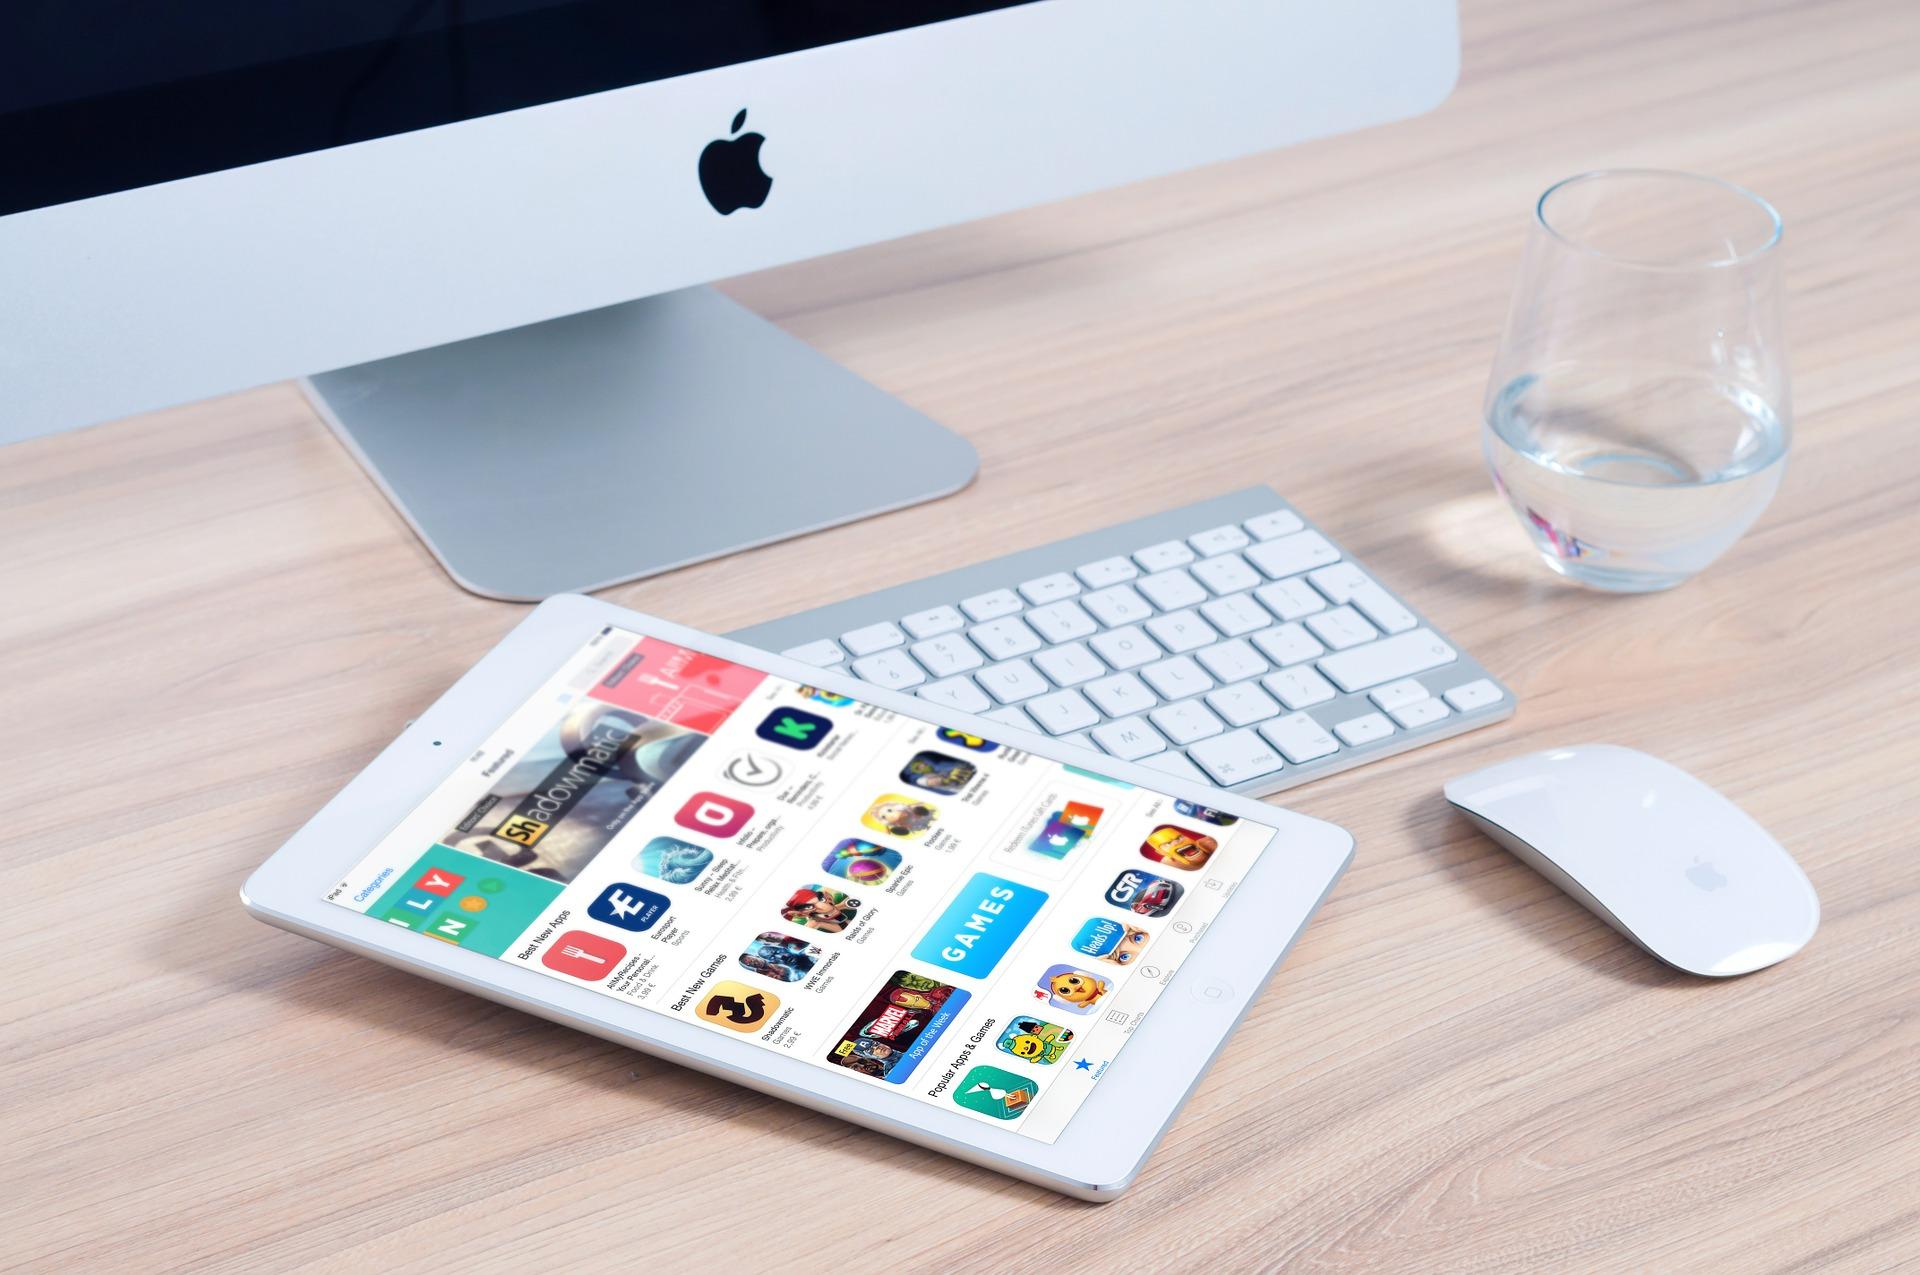 strumenti mac per la navigazione